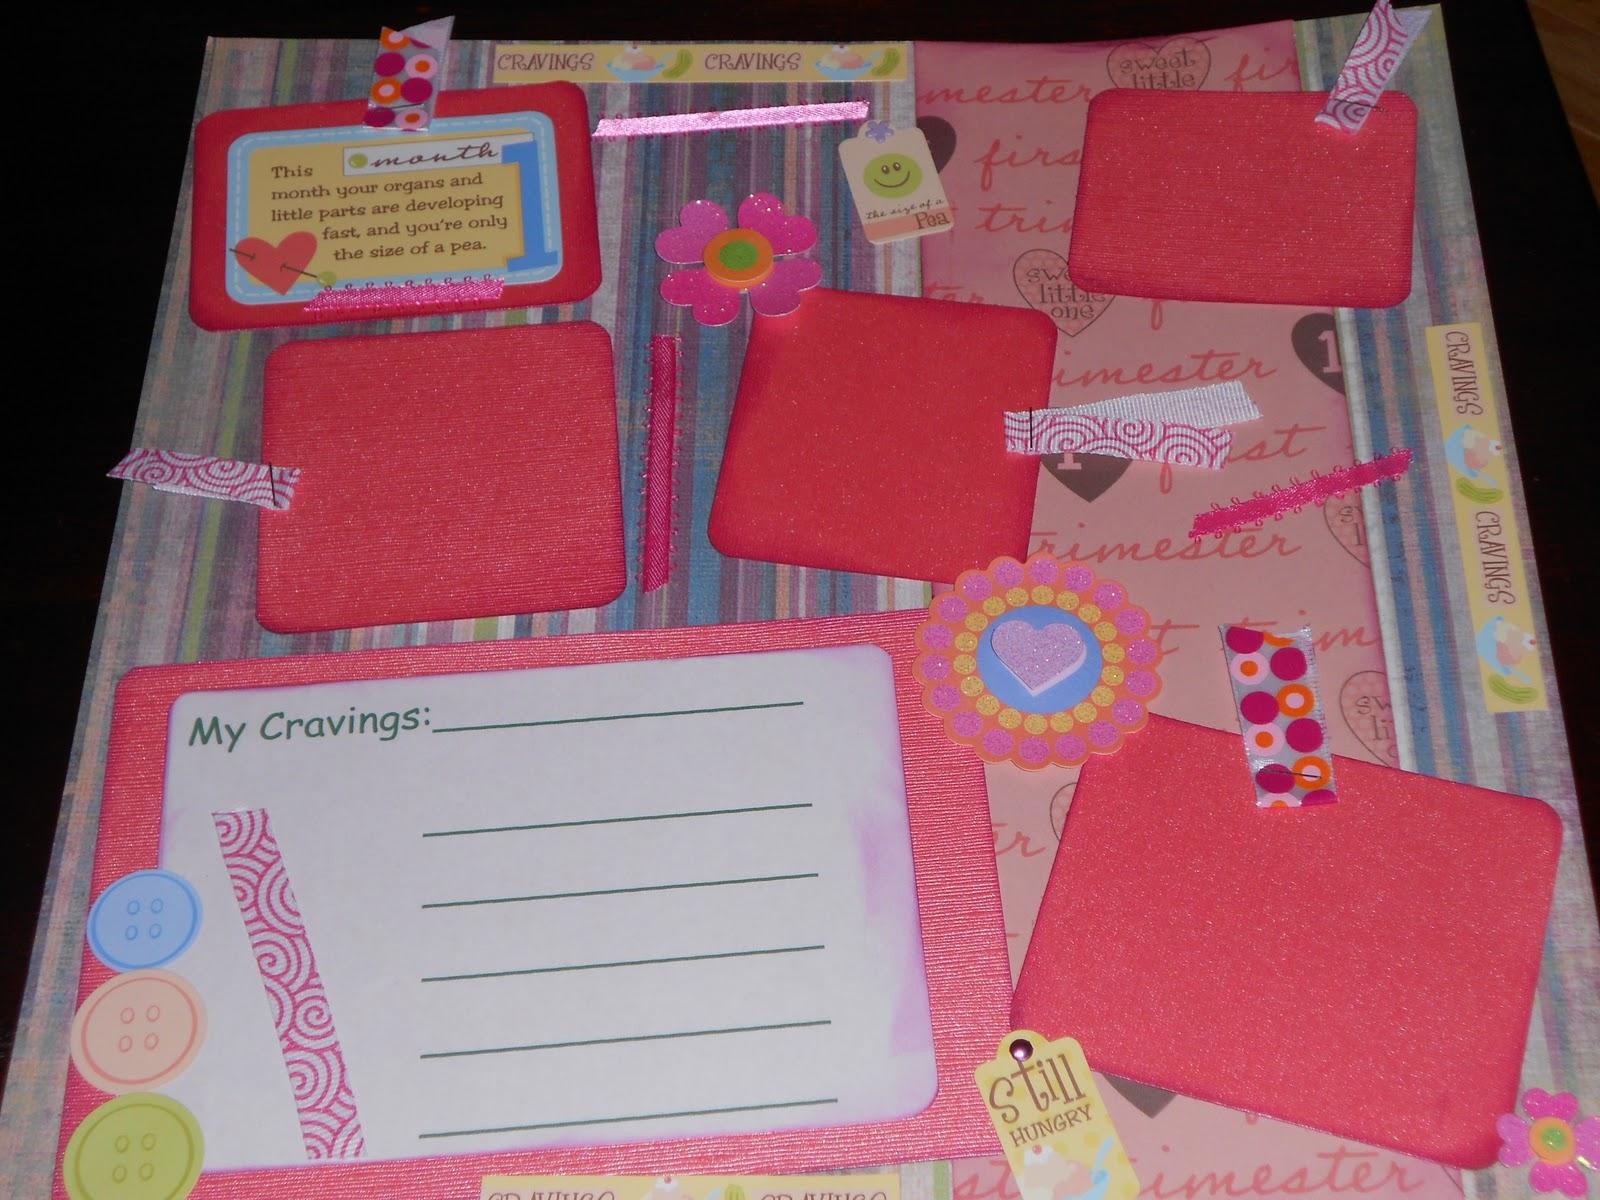 Baby scrapbook ideas quotes - 12x12 Premade Pregnancy Scrapbook Pages